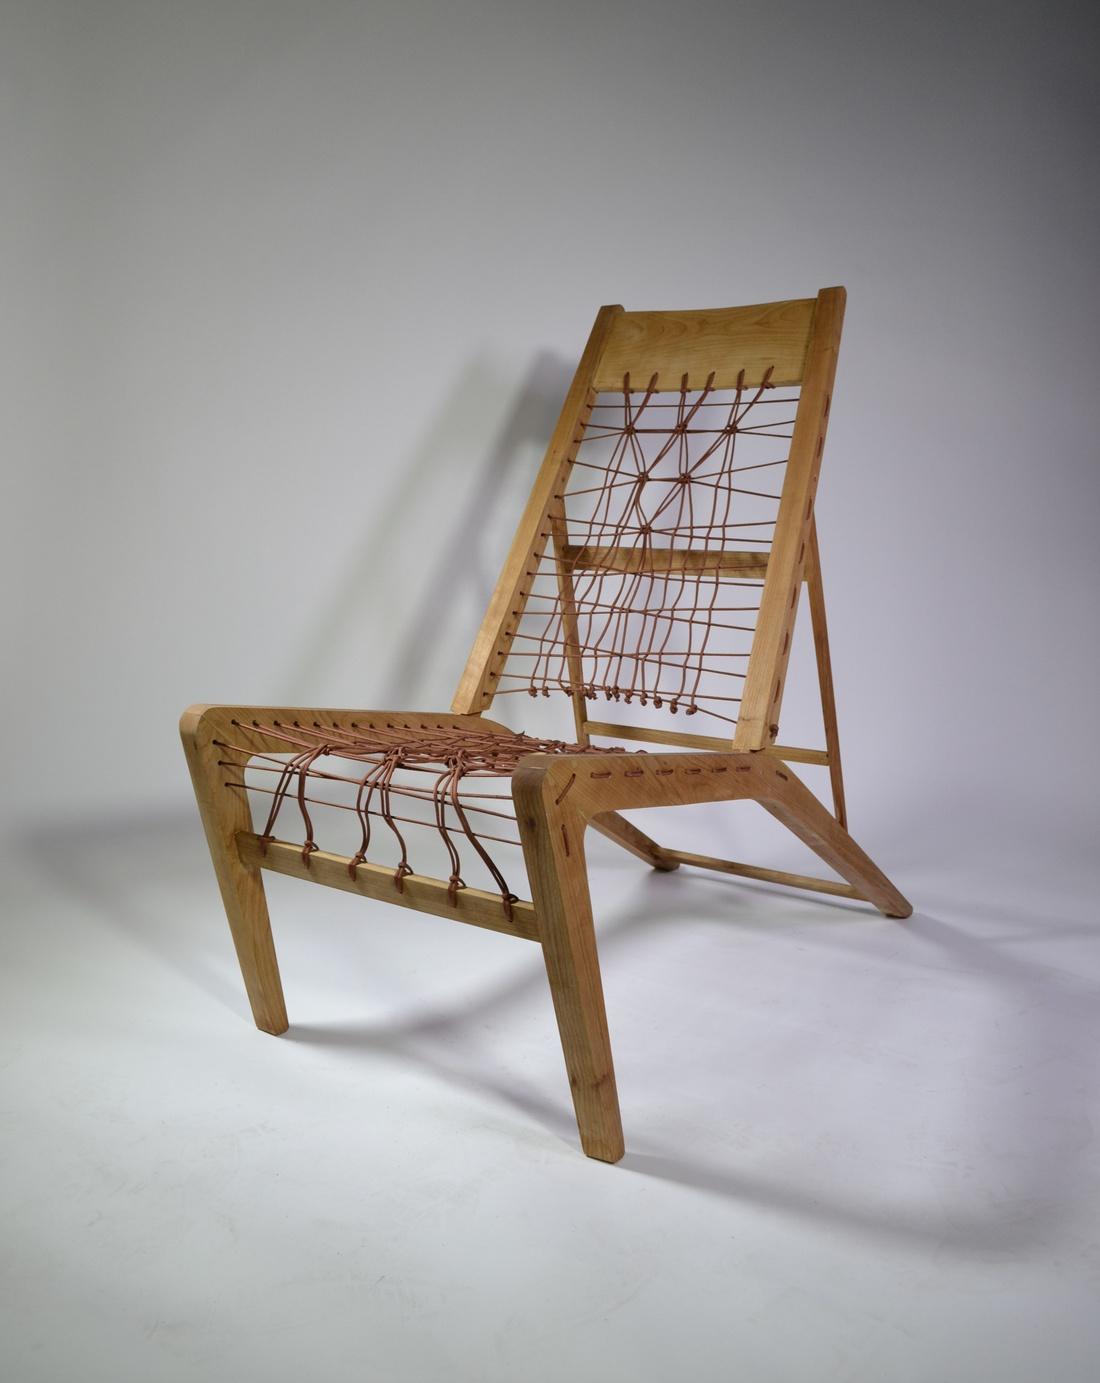 Chair by Jennifer Fontenot